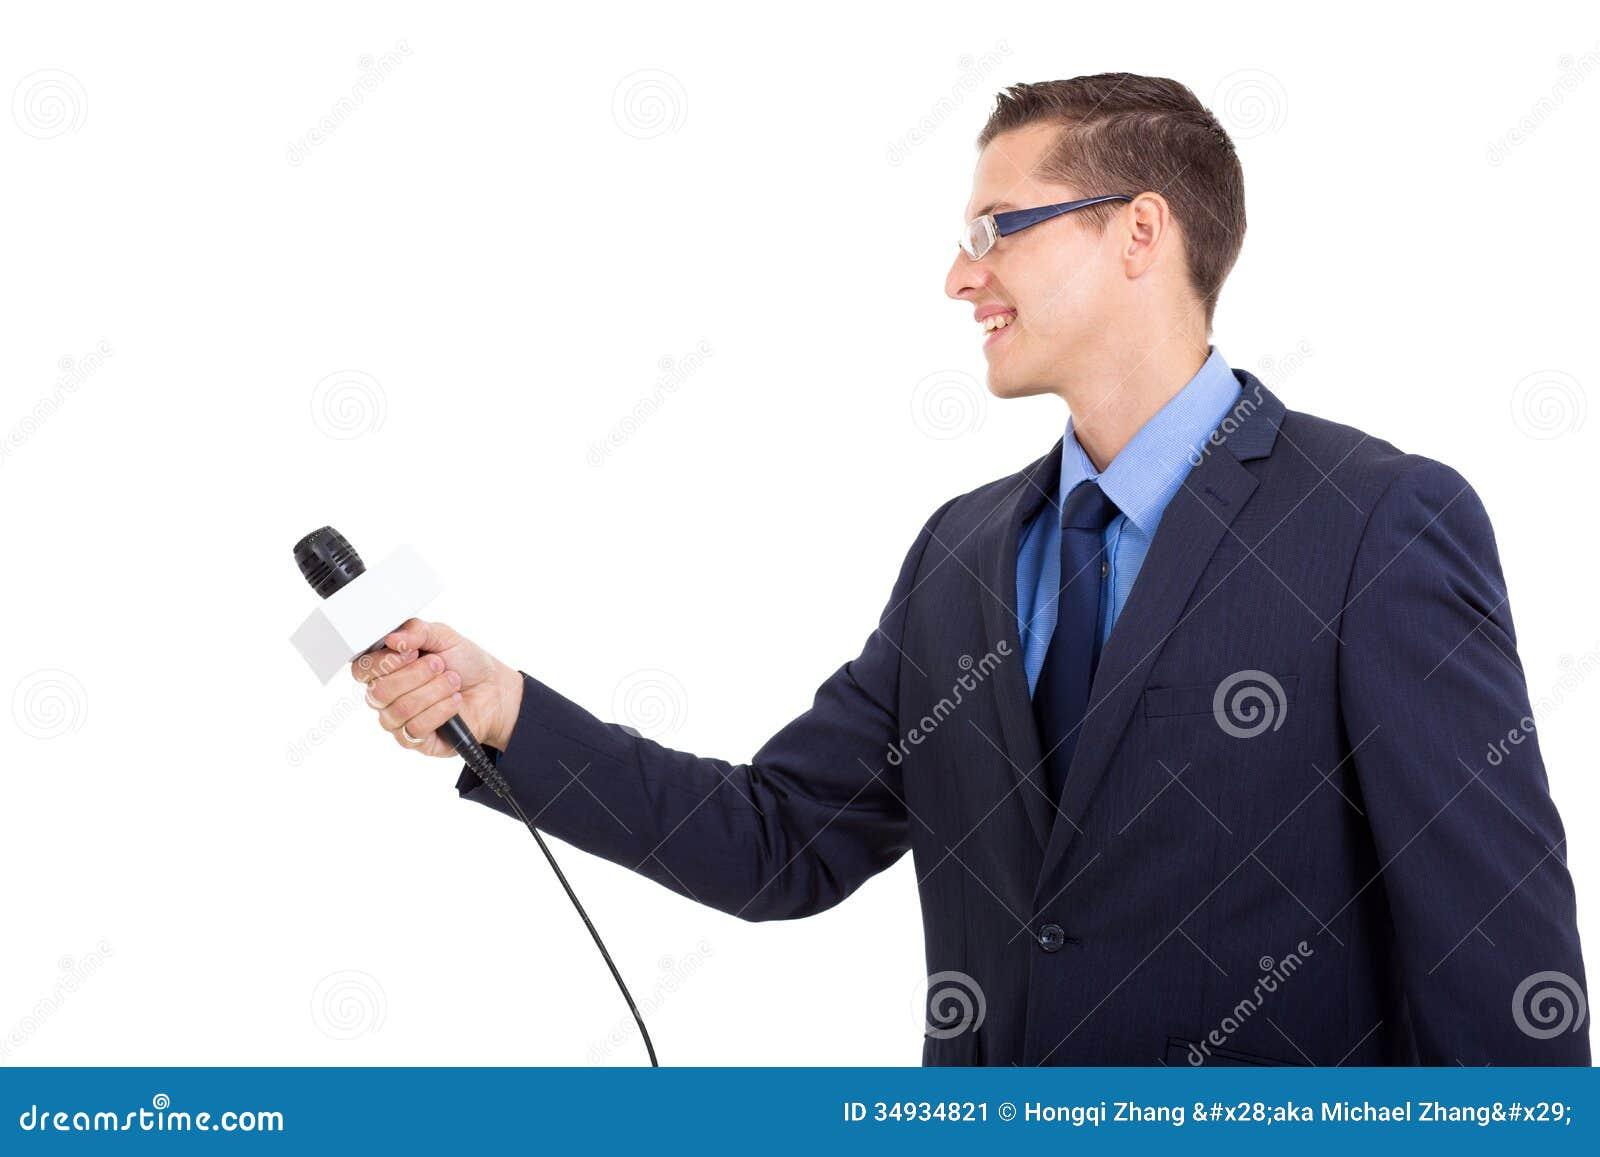 journalist interviewing stock image image  journalist interviewing